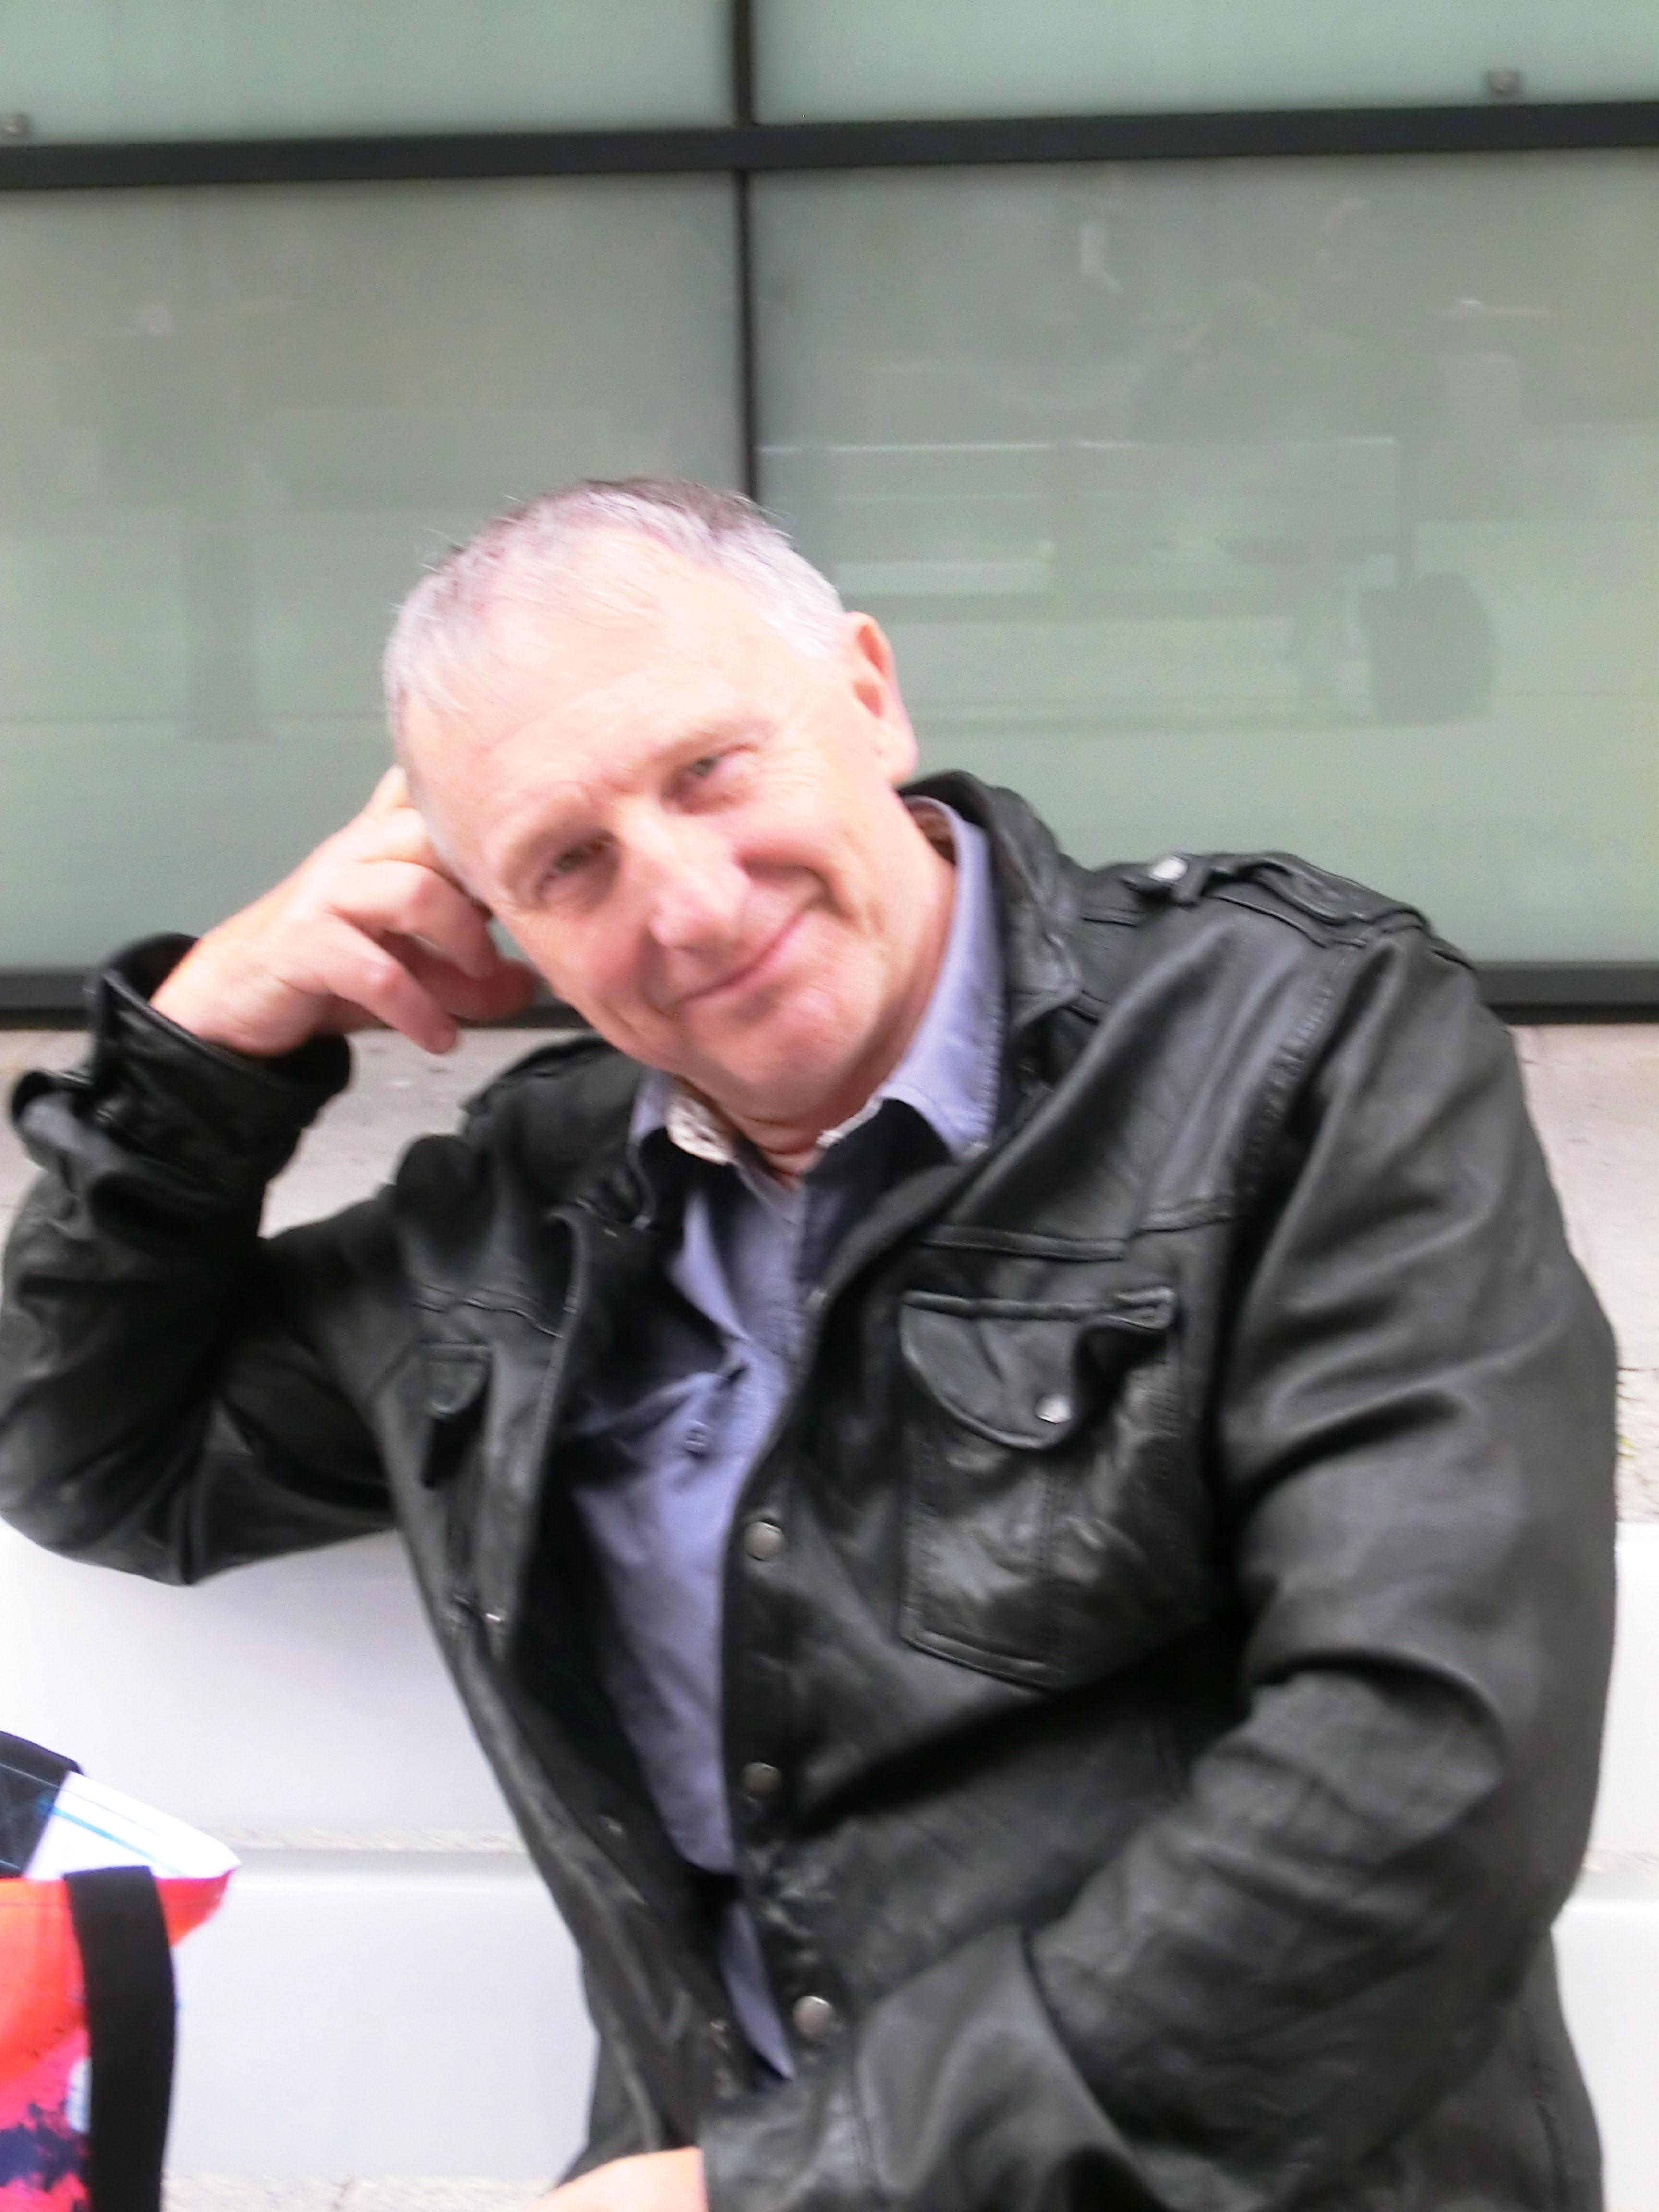 Annecy – samedi 4 avril 2020 à 14 heures – interview en direct sur YouTube avec Eric Zurcher